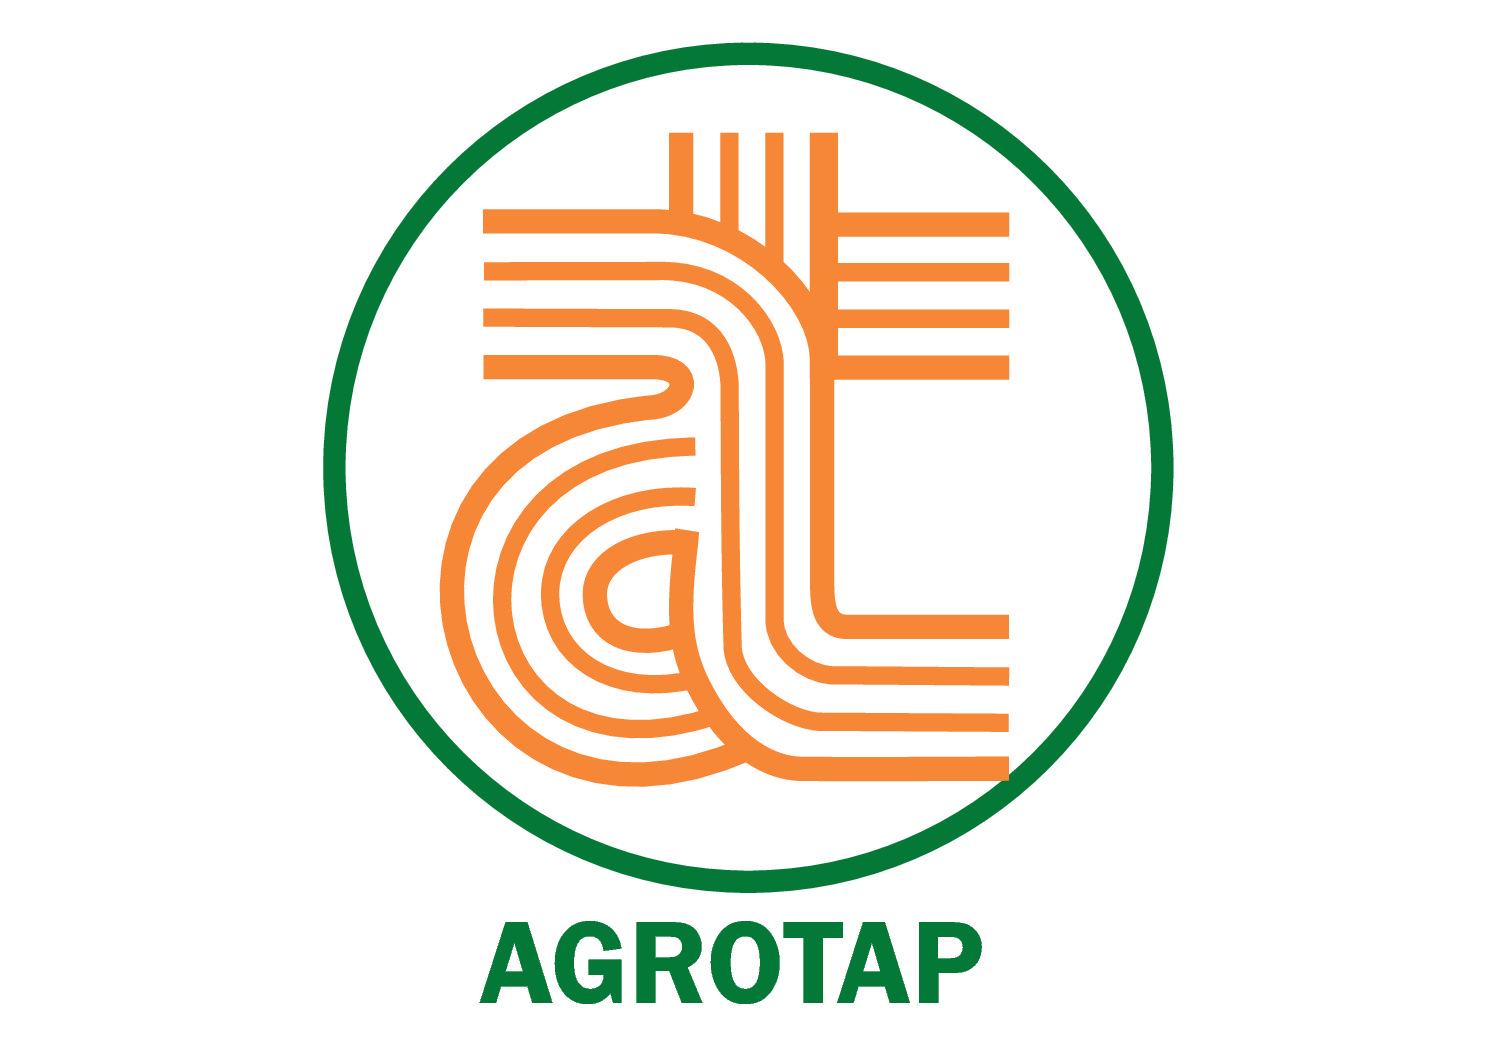 EQUIPE DE VETERANOS DA AGROTAP DE TAPERA/RS